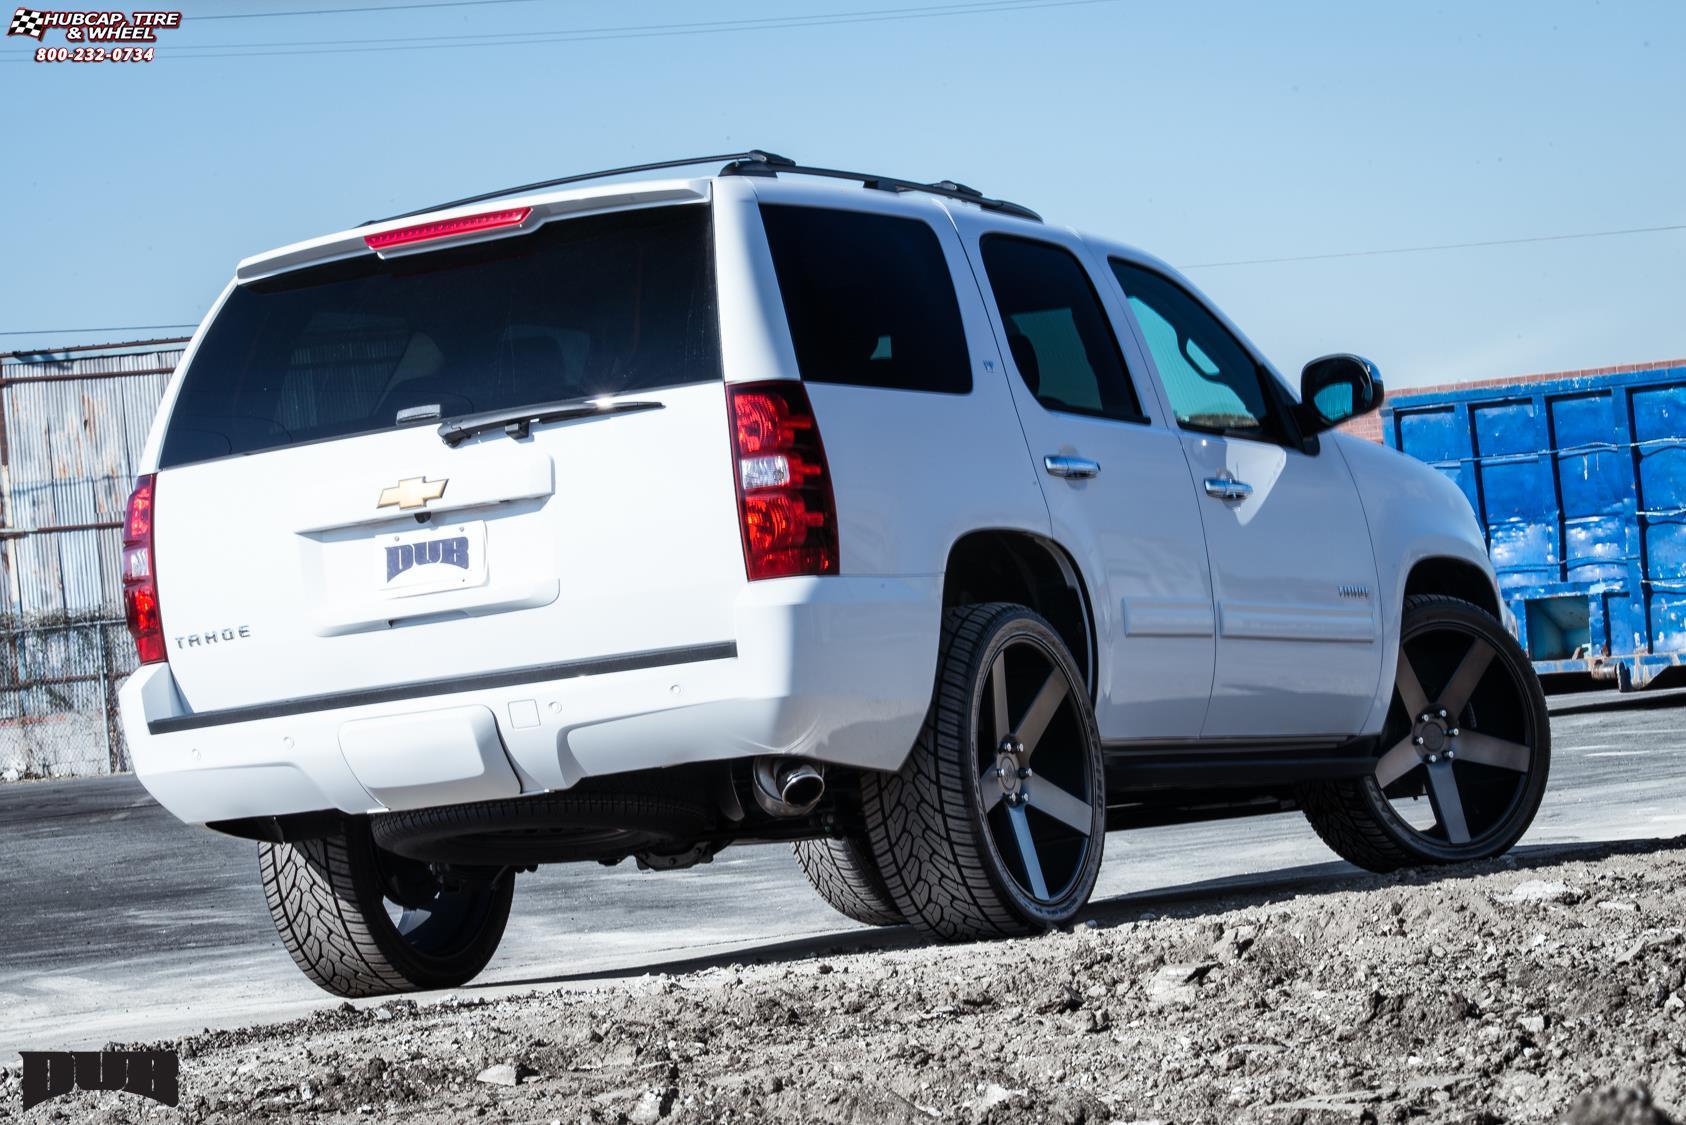 Chevrolet Tahoe Dub Baller - S116 Wheels Black & Machined ...